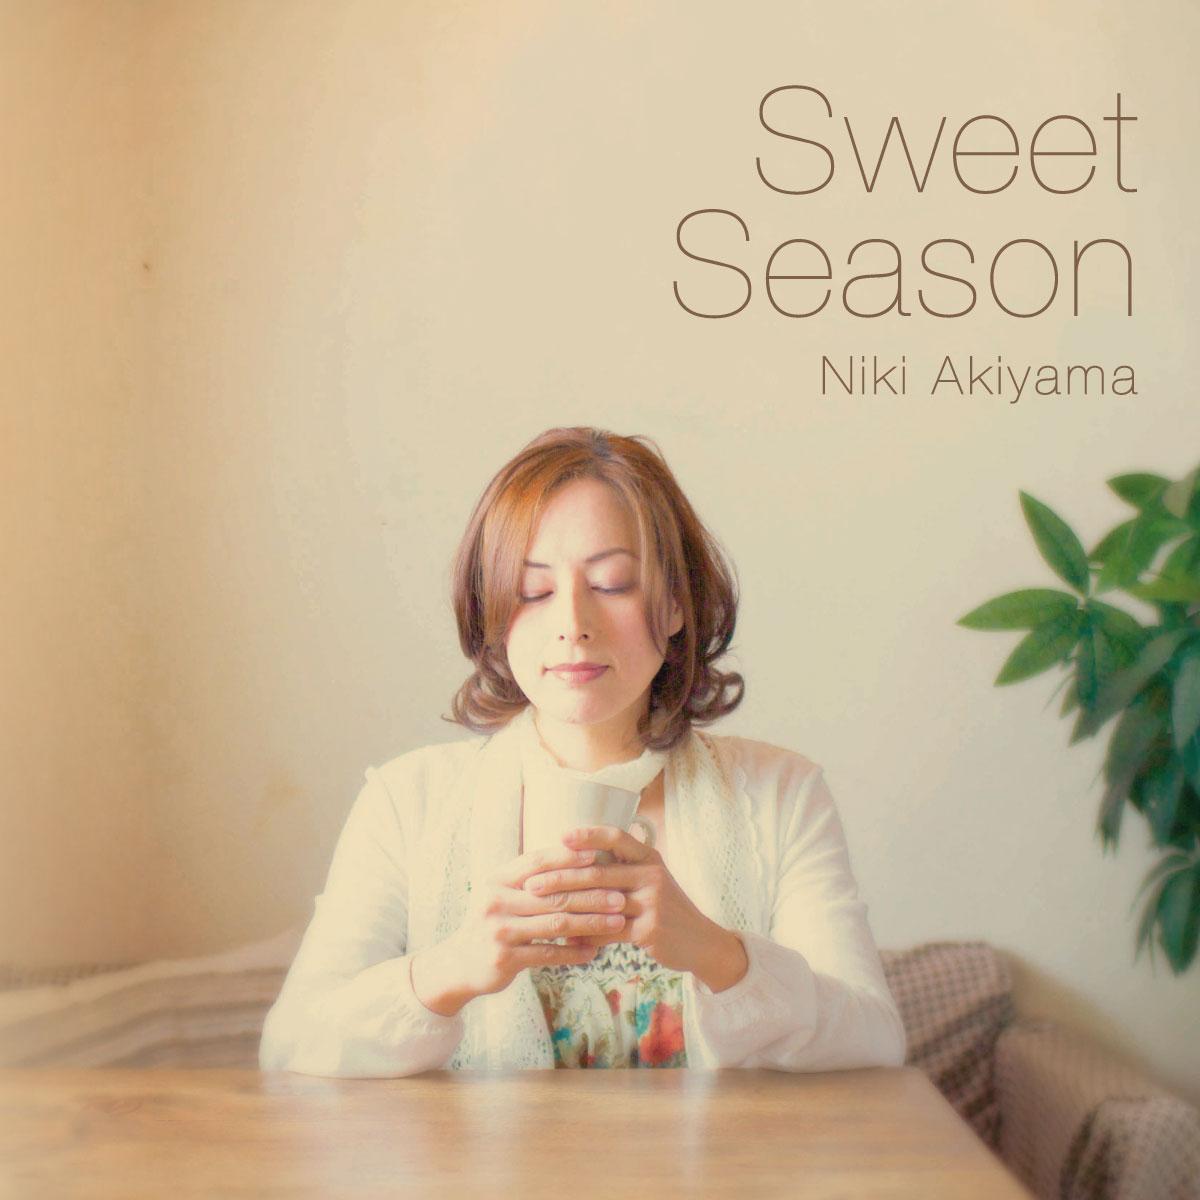 sweet season 秋山仁希